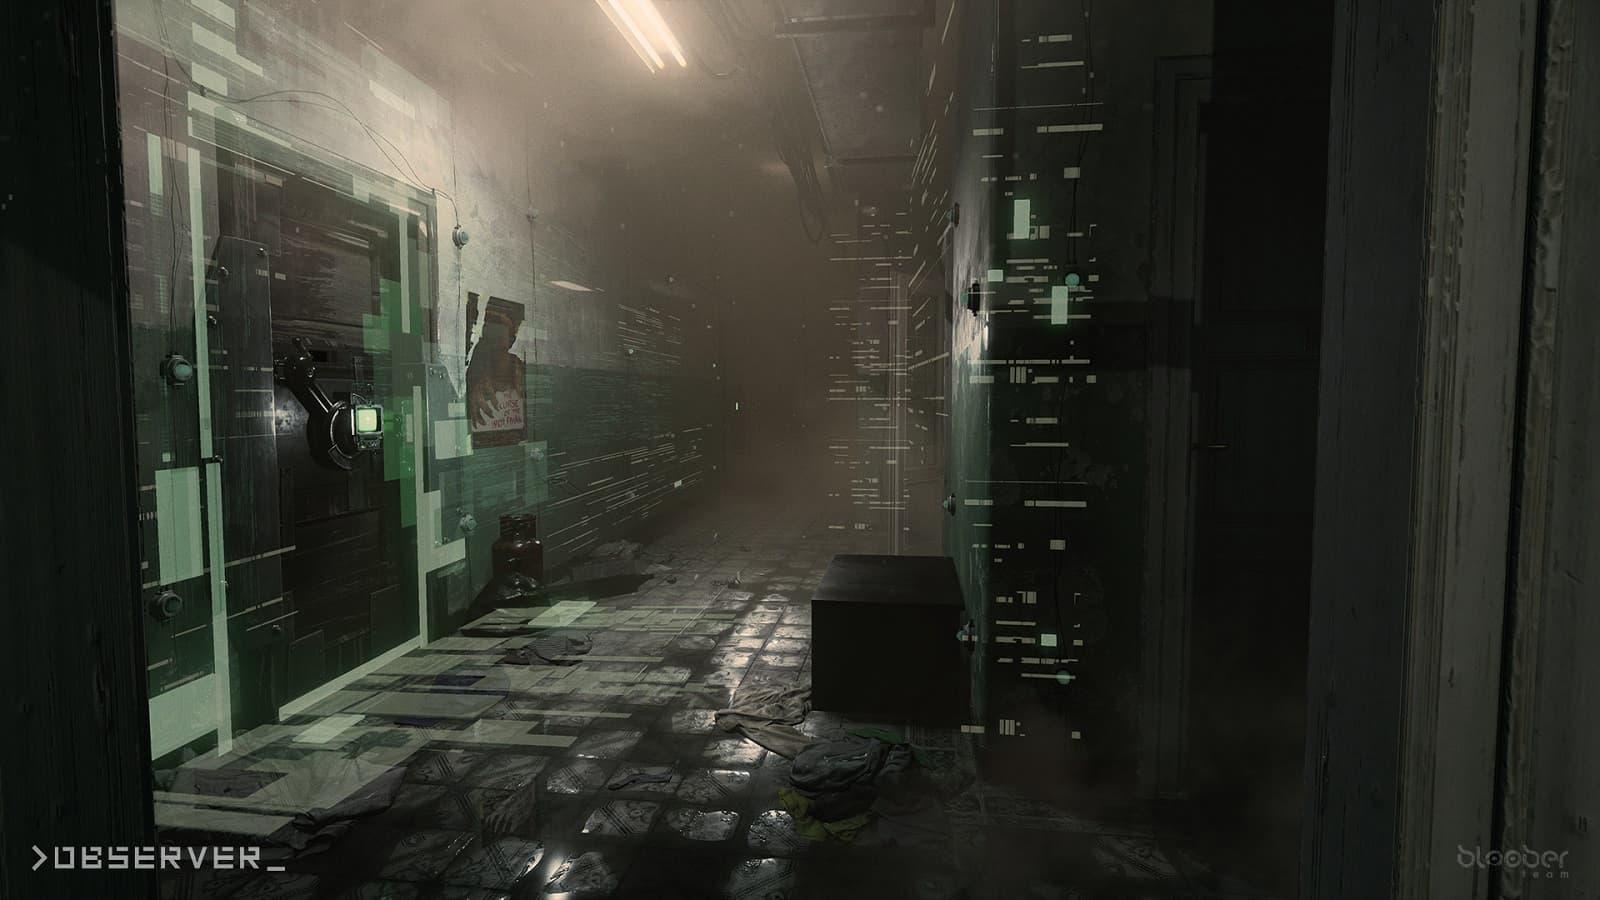 Observer, >observer_, Bloober Team, SciFi, Cyberpunk, Dystopia, Postapocalyspe, Adventure, Walking Simulator, Horror, Stealth, Inde Game, Review, фантастика, киберпанк, антиутопия, постапокалипсис, приключенческая игра, симулятор ходьбы, ужасы, хоррор, инди-игра, обзор, рецензия